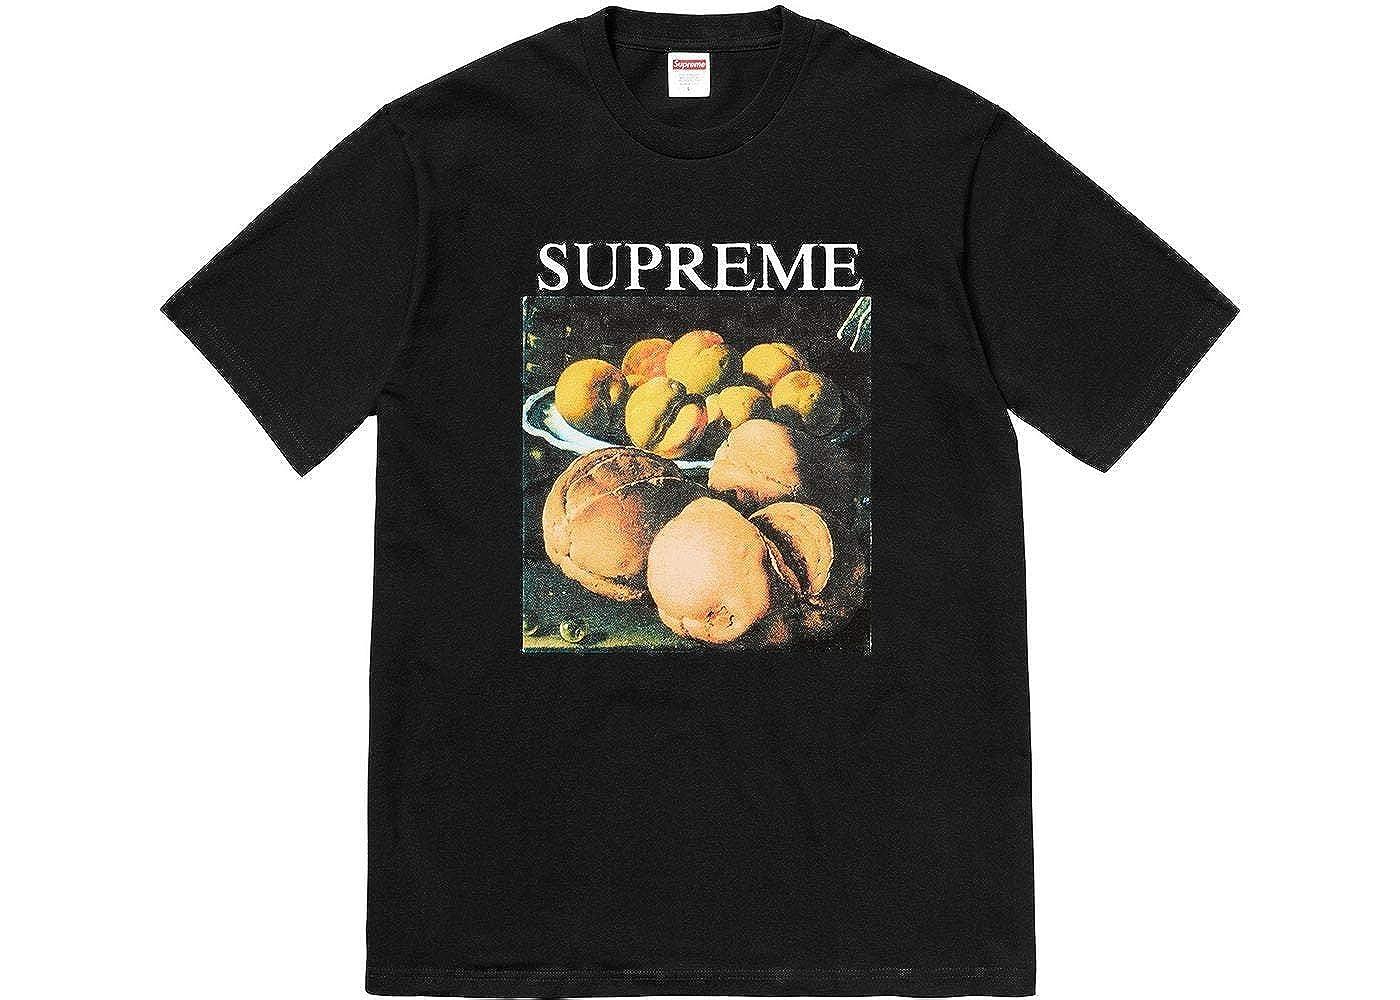 Com Supremenewyork Supreme Still Life Tee T Shirt Black Fw18 100 Authentic Real Rare Clothing